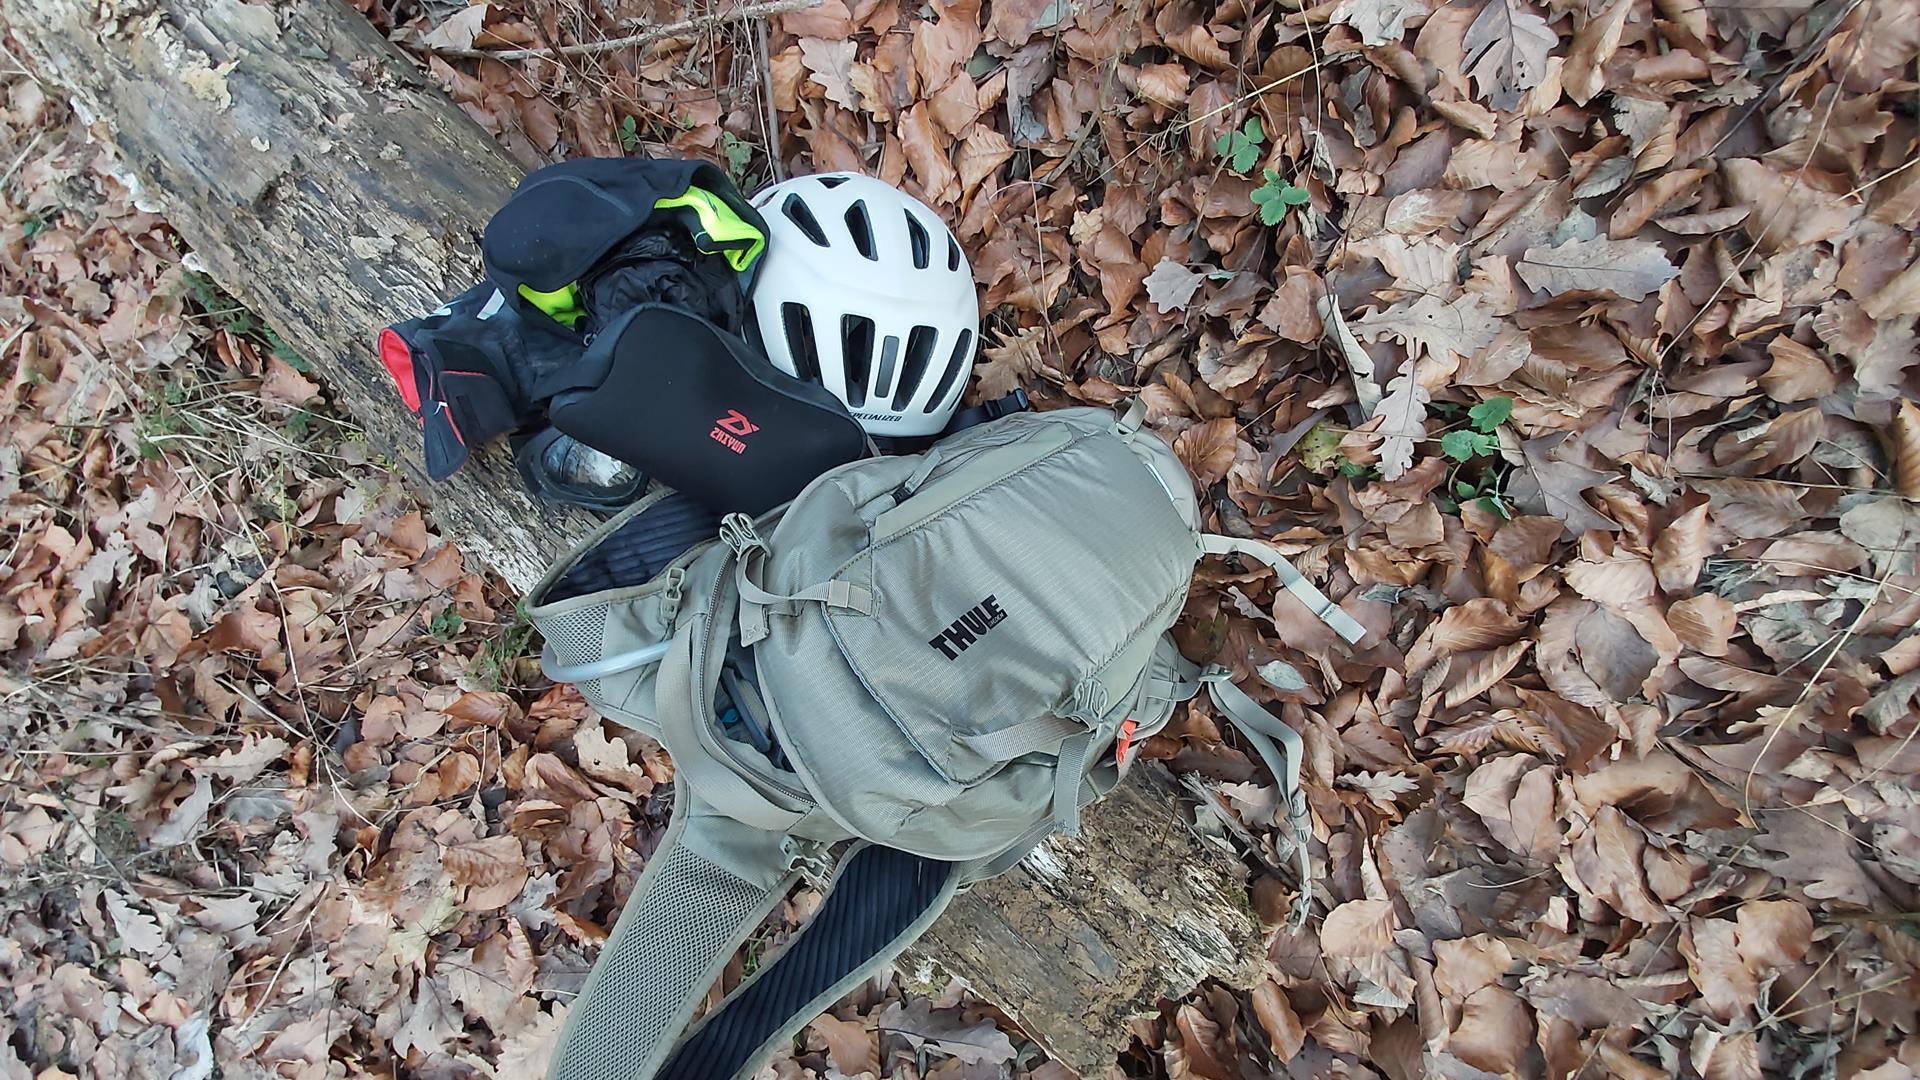 zima_mtb_biciklizam10.jpg (502 KB)